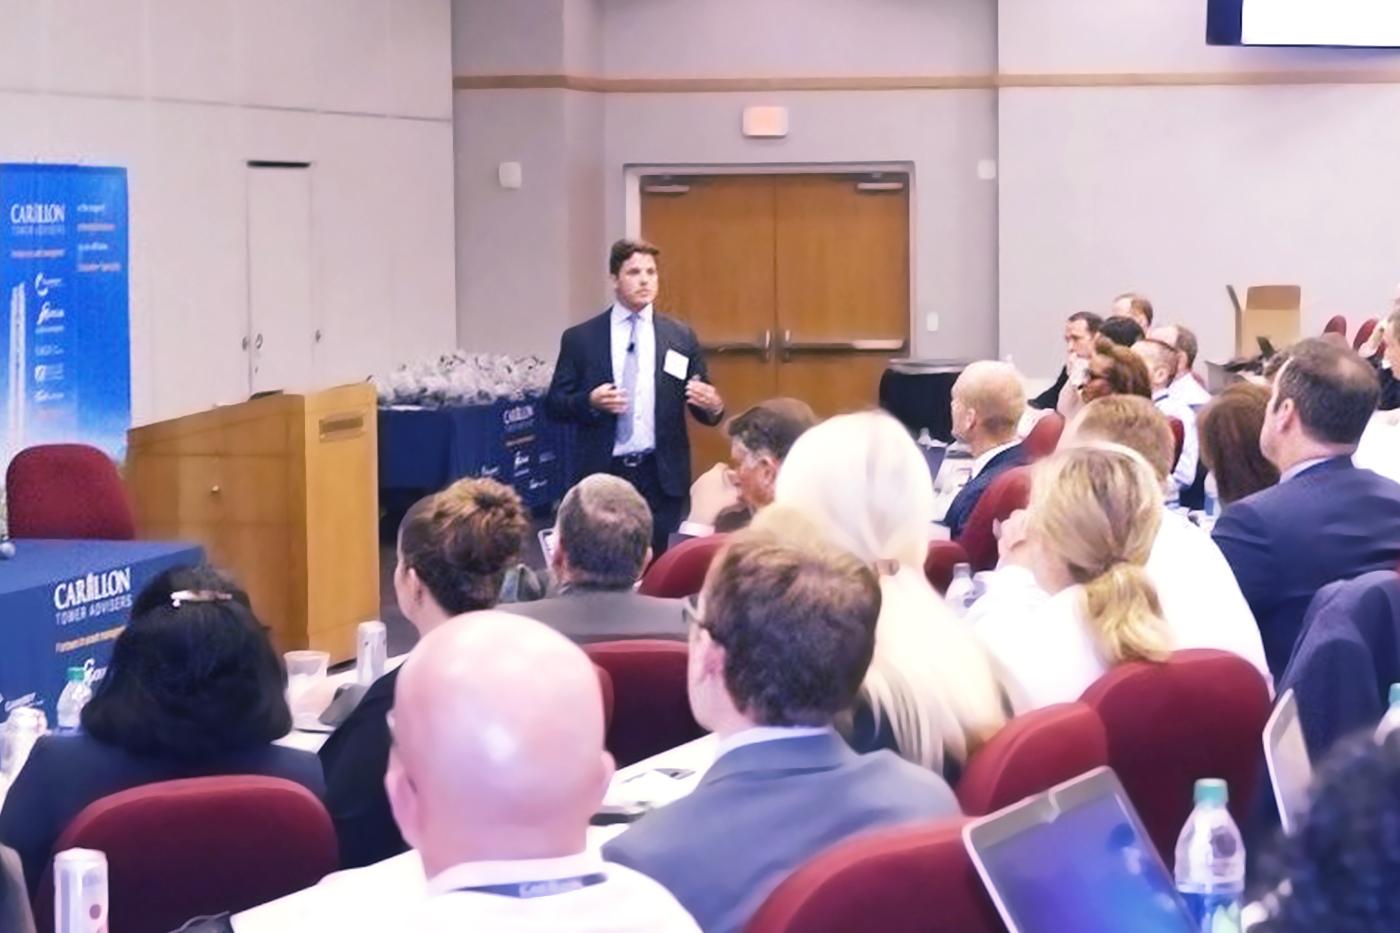 CTA_Sales_Meeting_PullUp_Banner_Mockup03